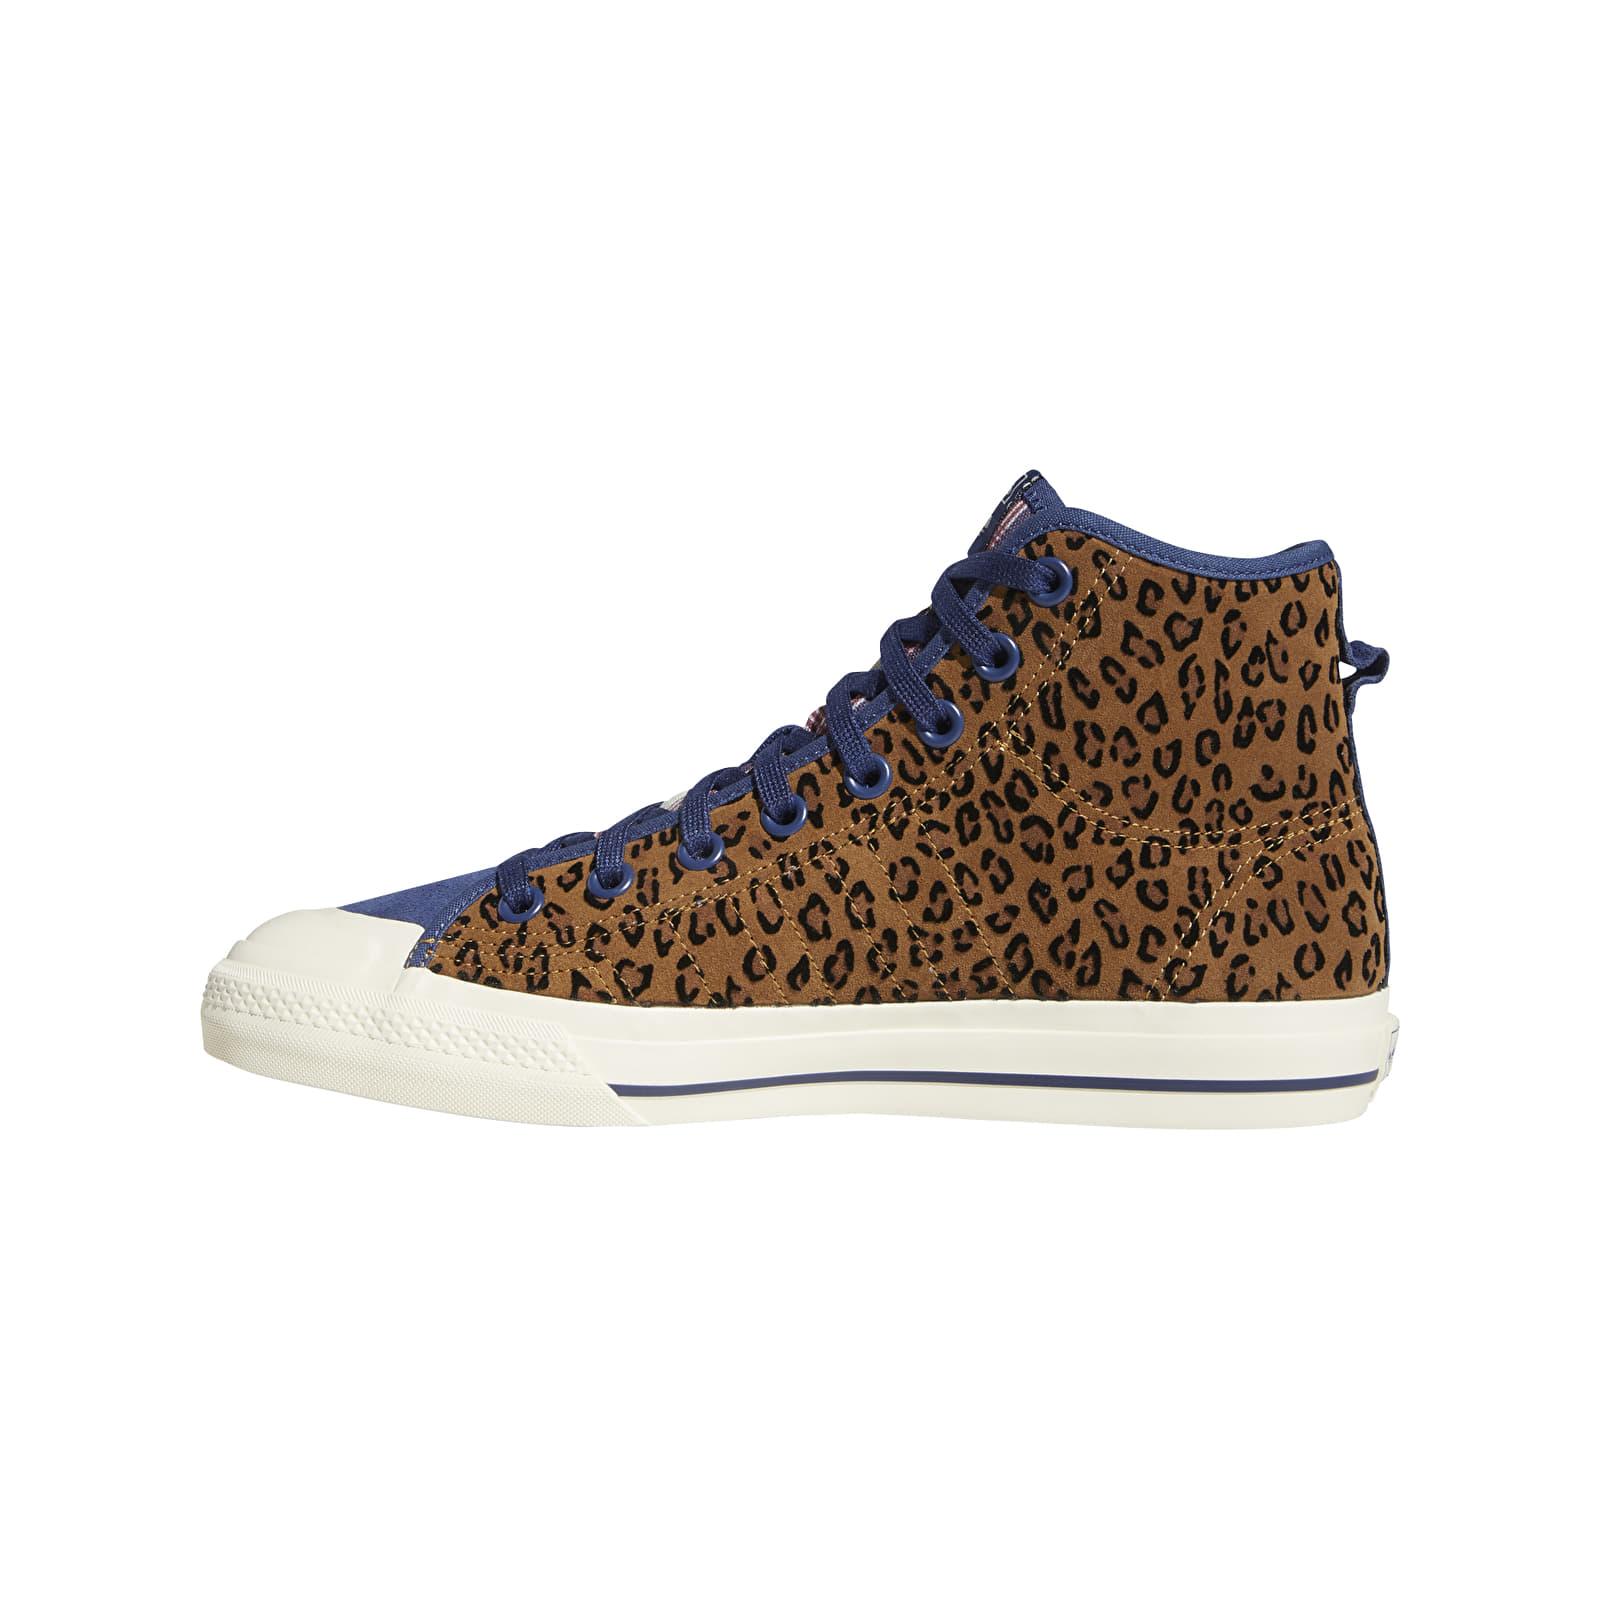 Men's shoes adidas Nizza Hi RF Tech